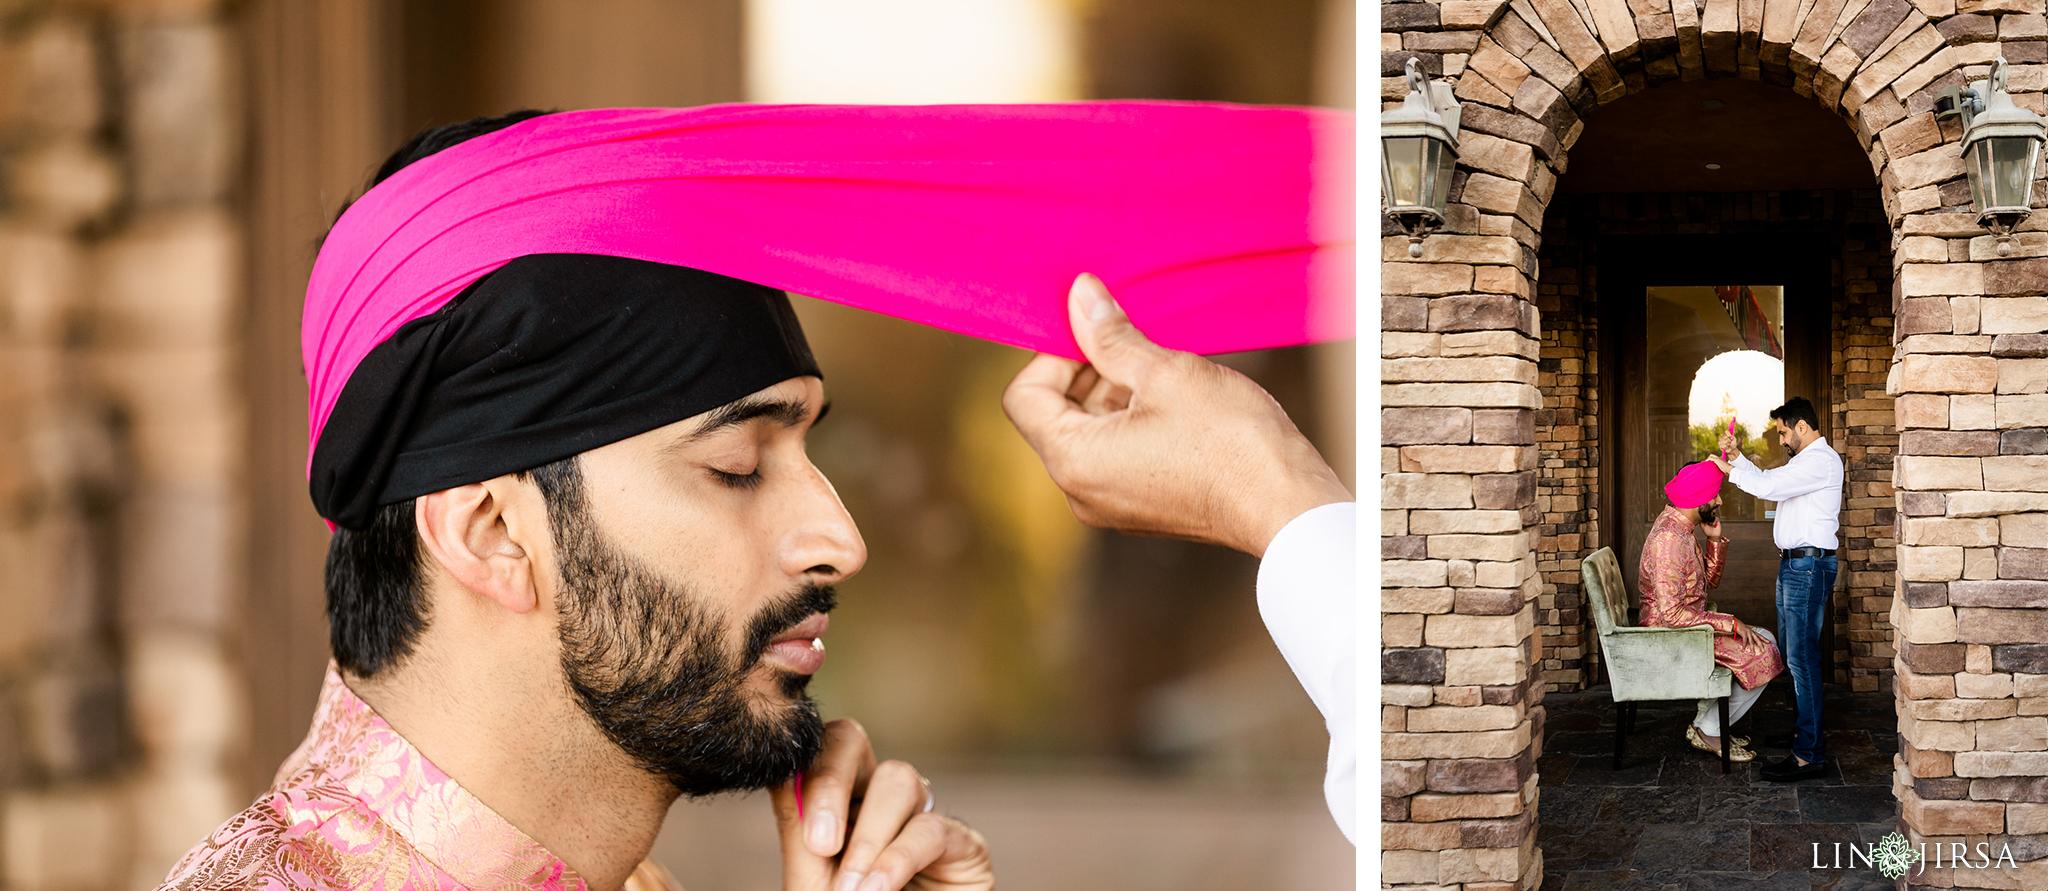 06 Coronado Resort and Spa San Diego Punjabi Wedding Photography